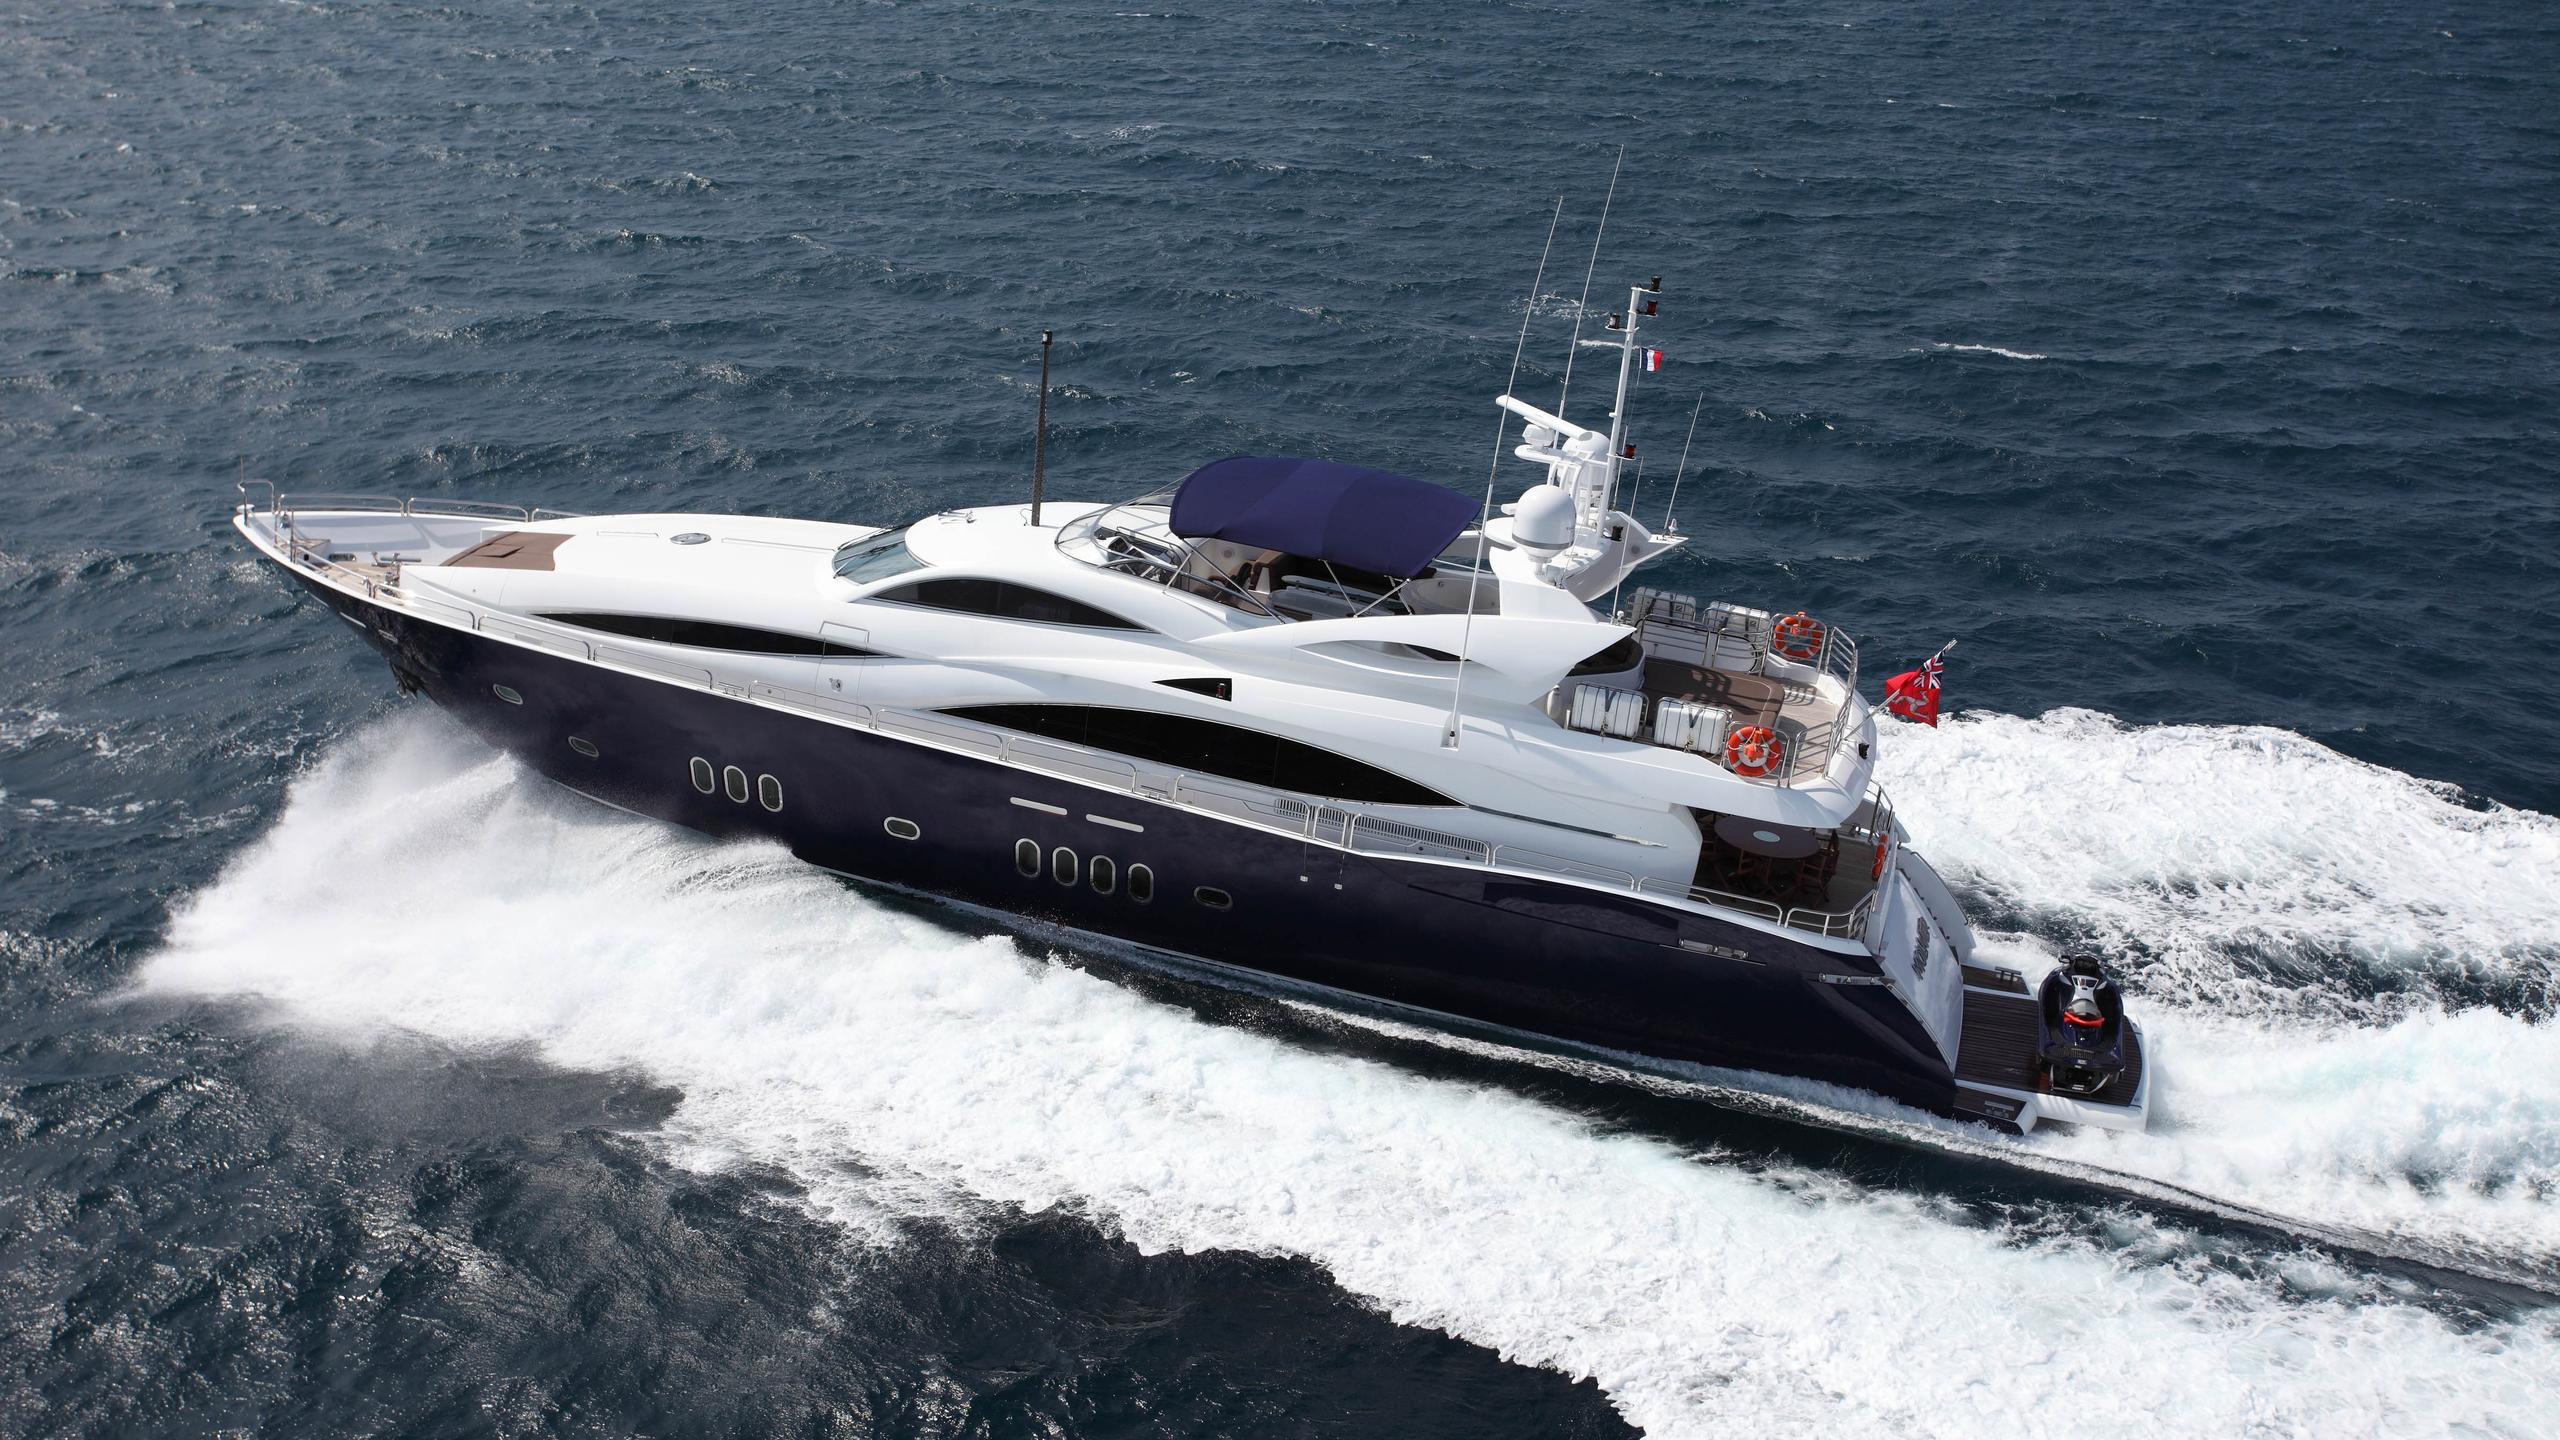 moliver-yacht-at-sea